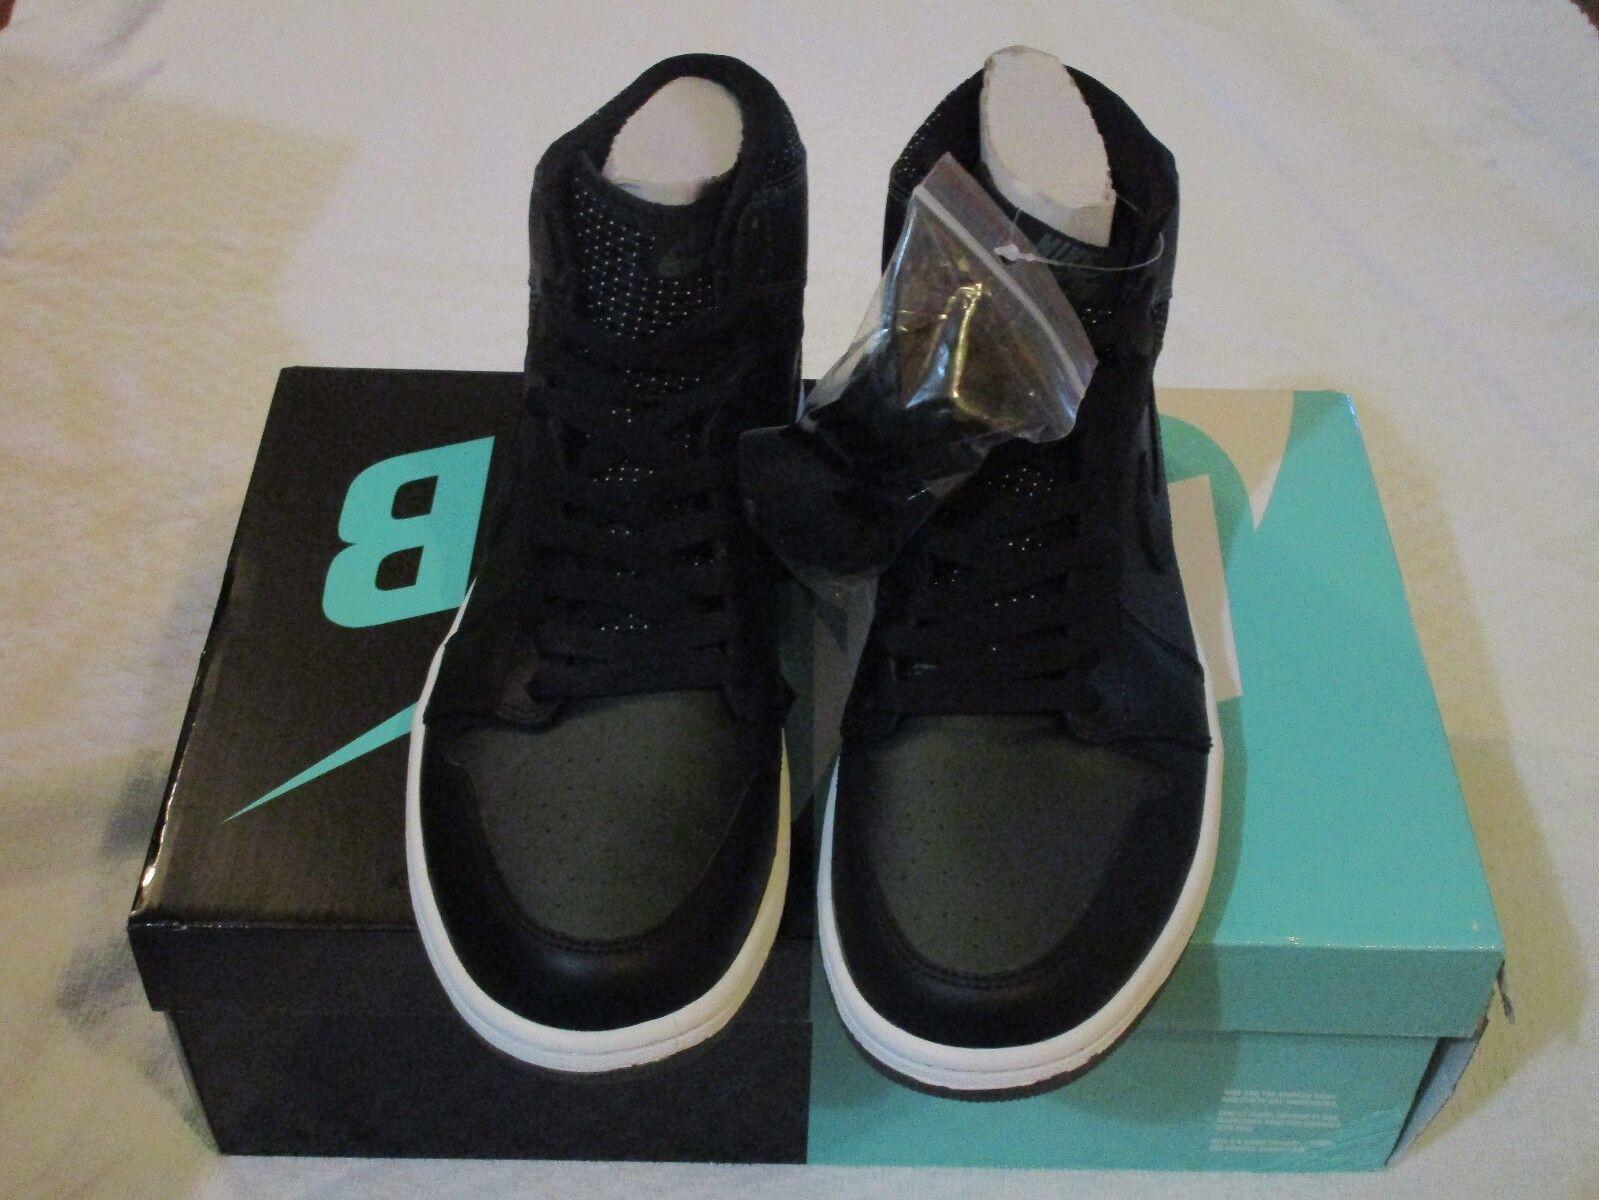 Nike Jordan 1 SB QS Black Silver Craig Stecyk 653532 001 Size 11 Sneakers